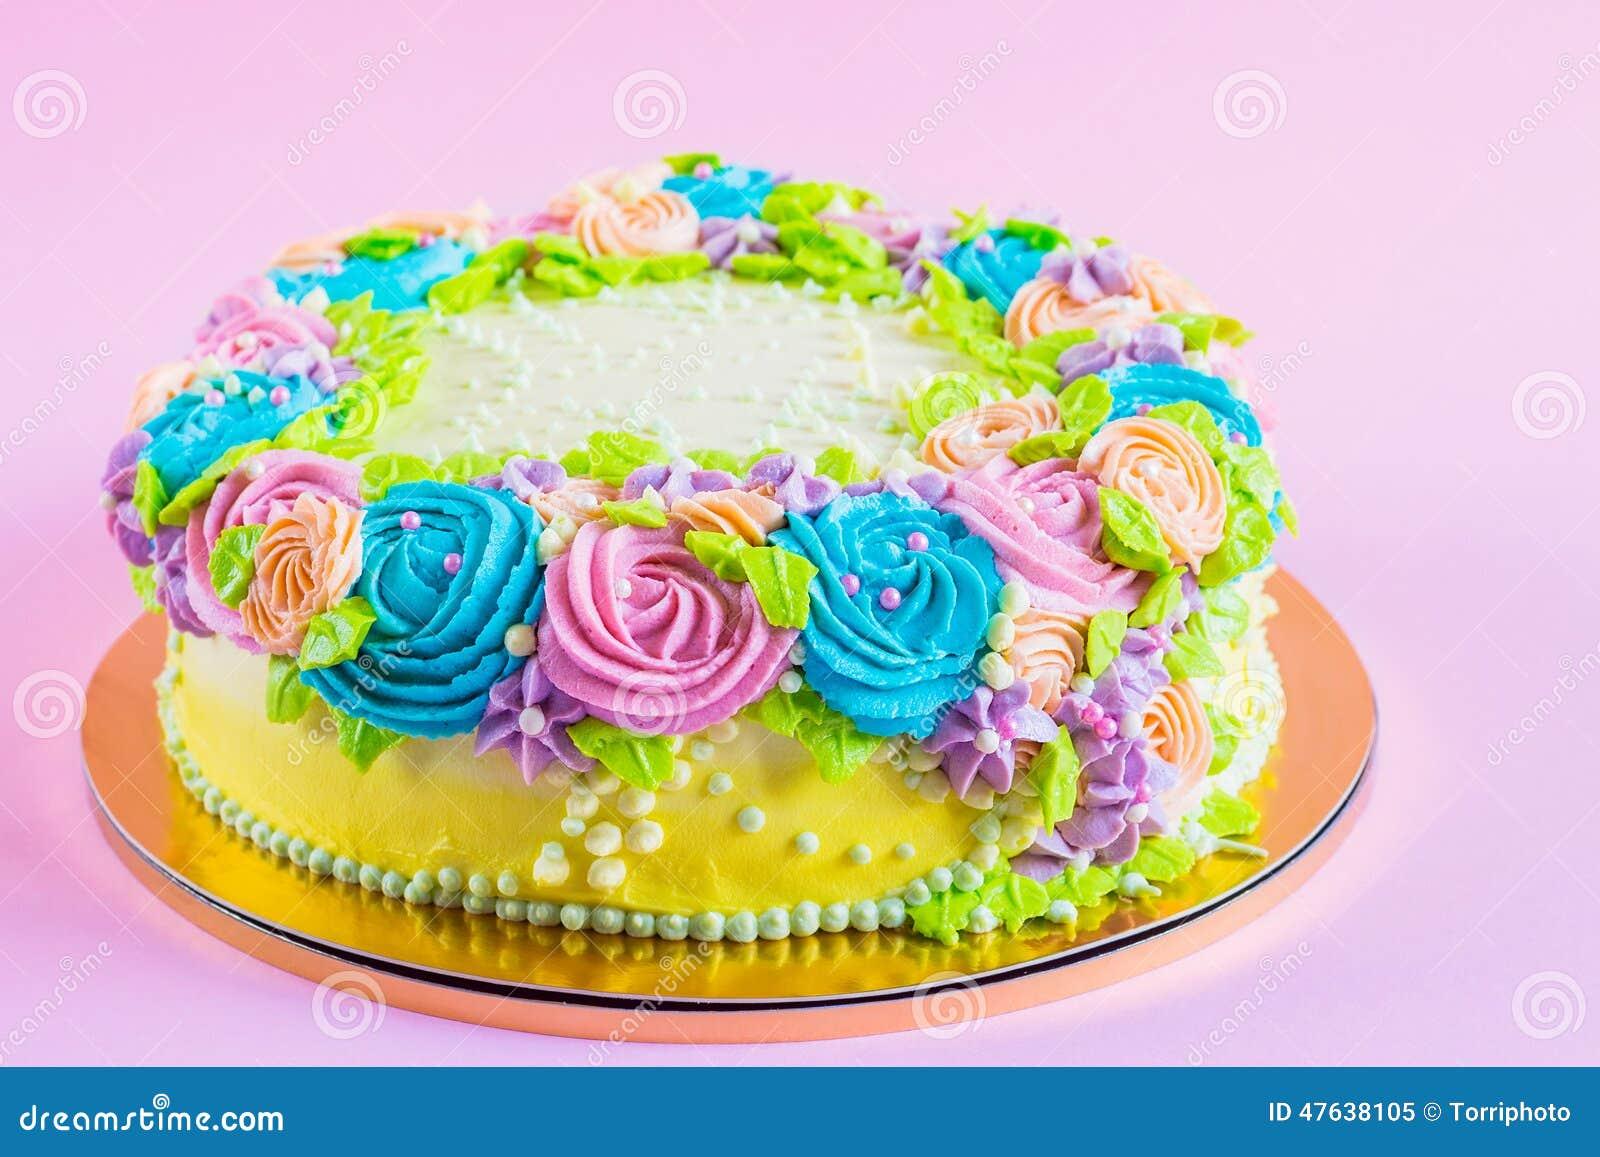 Neon Birthday Cake Recipes